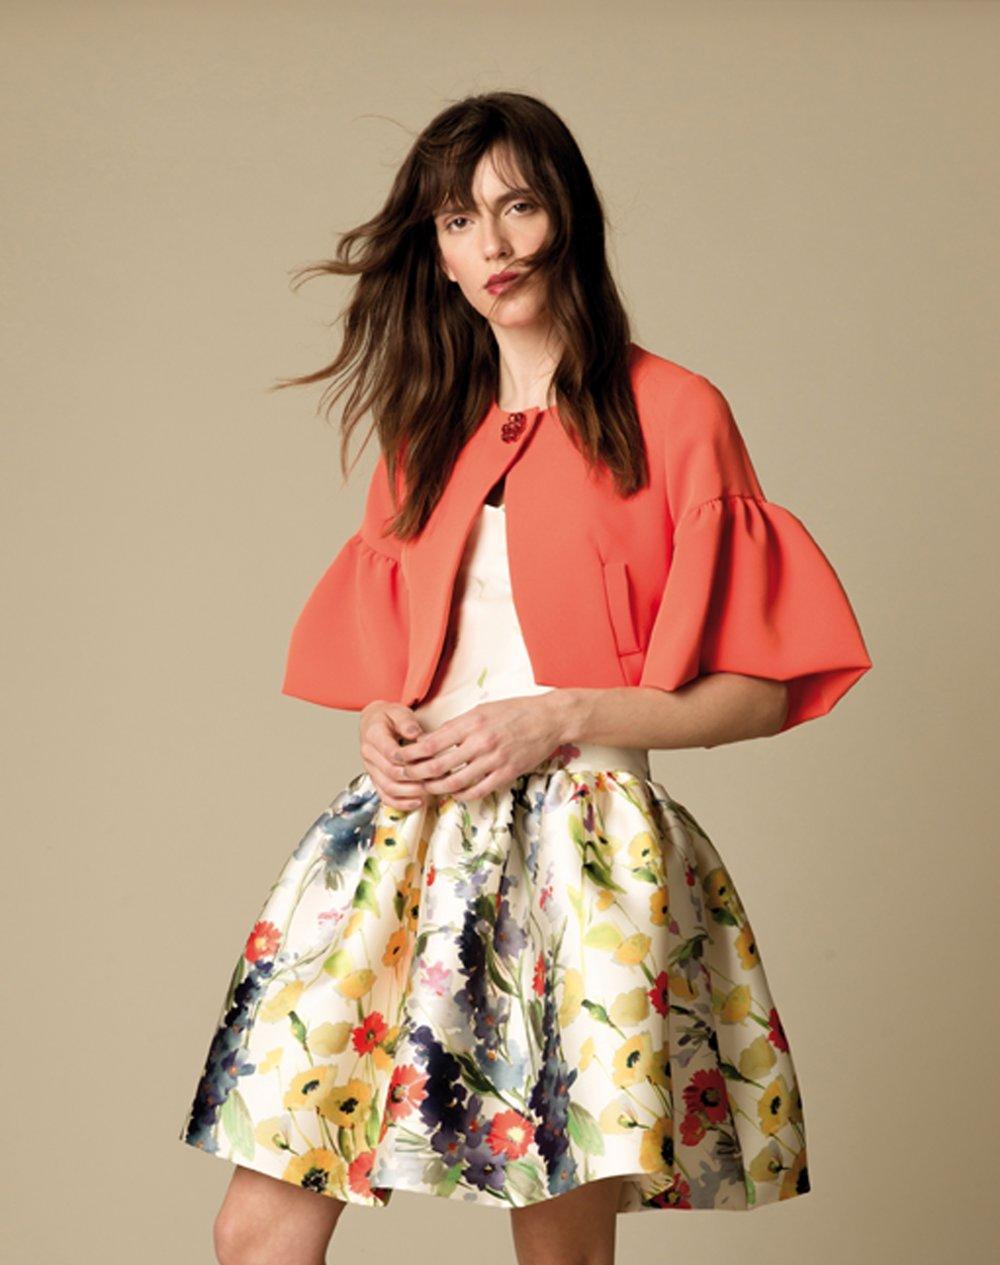 - Kleid Valentina - Seidentaft mit BlütenmotivJacke Flocke - orangener schwerer Crêpe Stretch